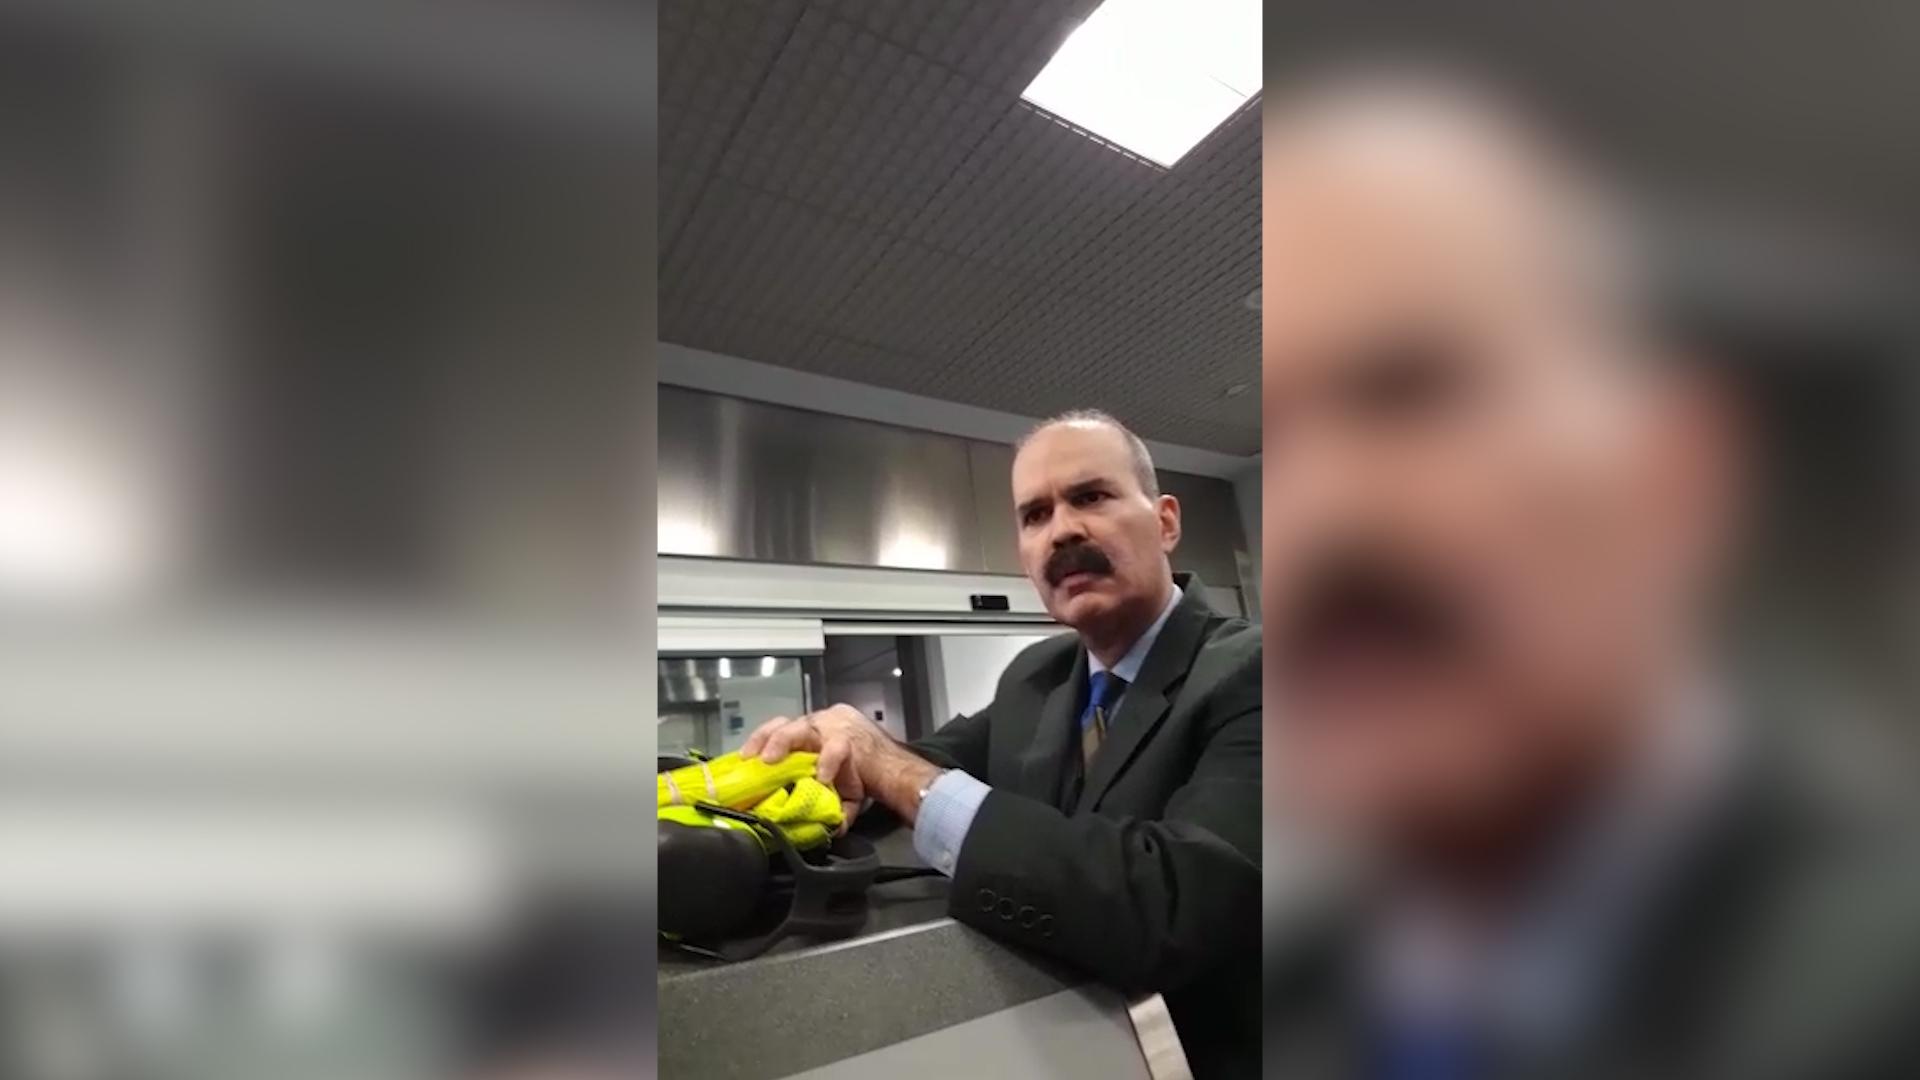 Jewish family kicked off flight over 'body odor' sues American Airlines, alleging discrimination